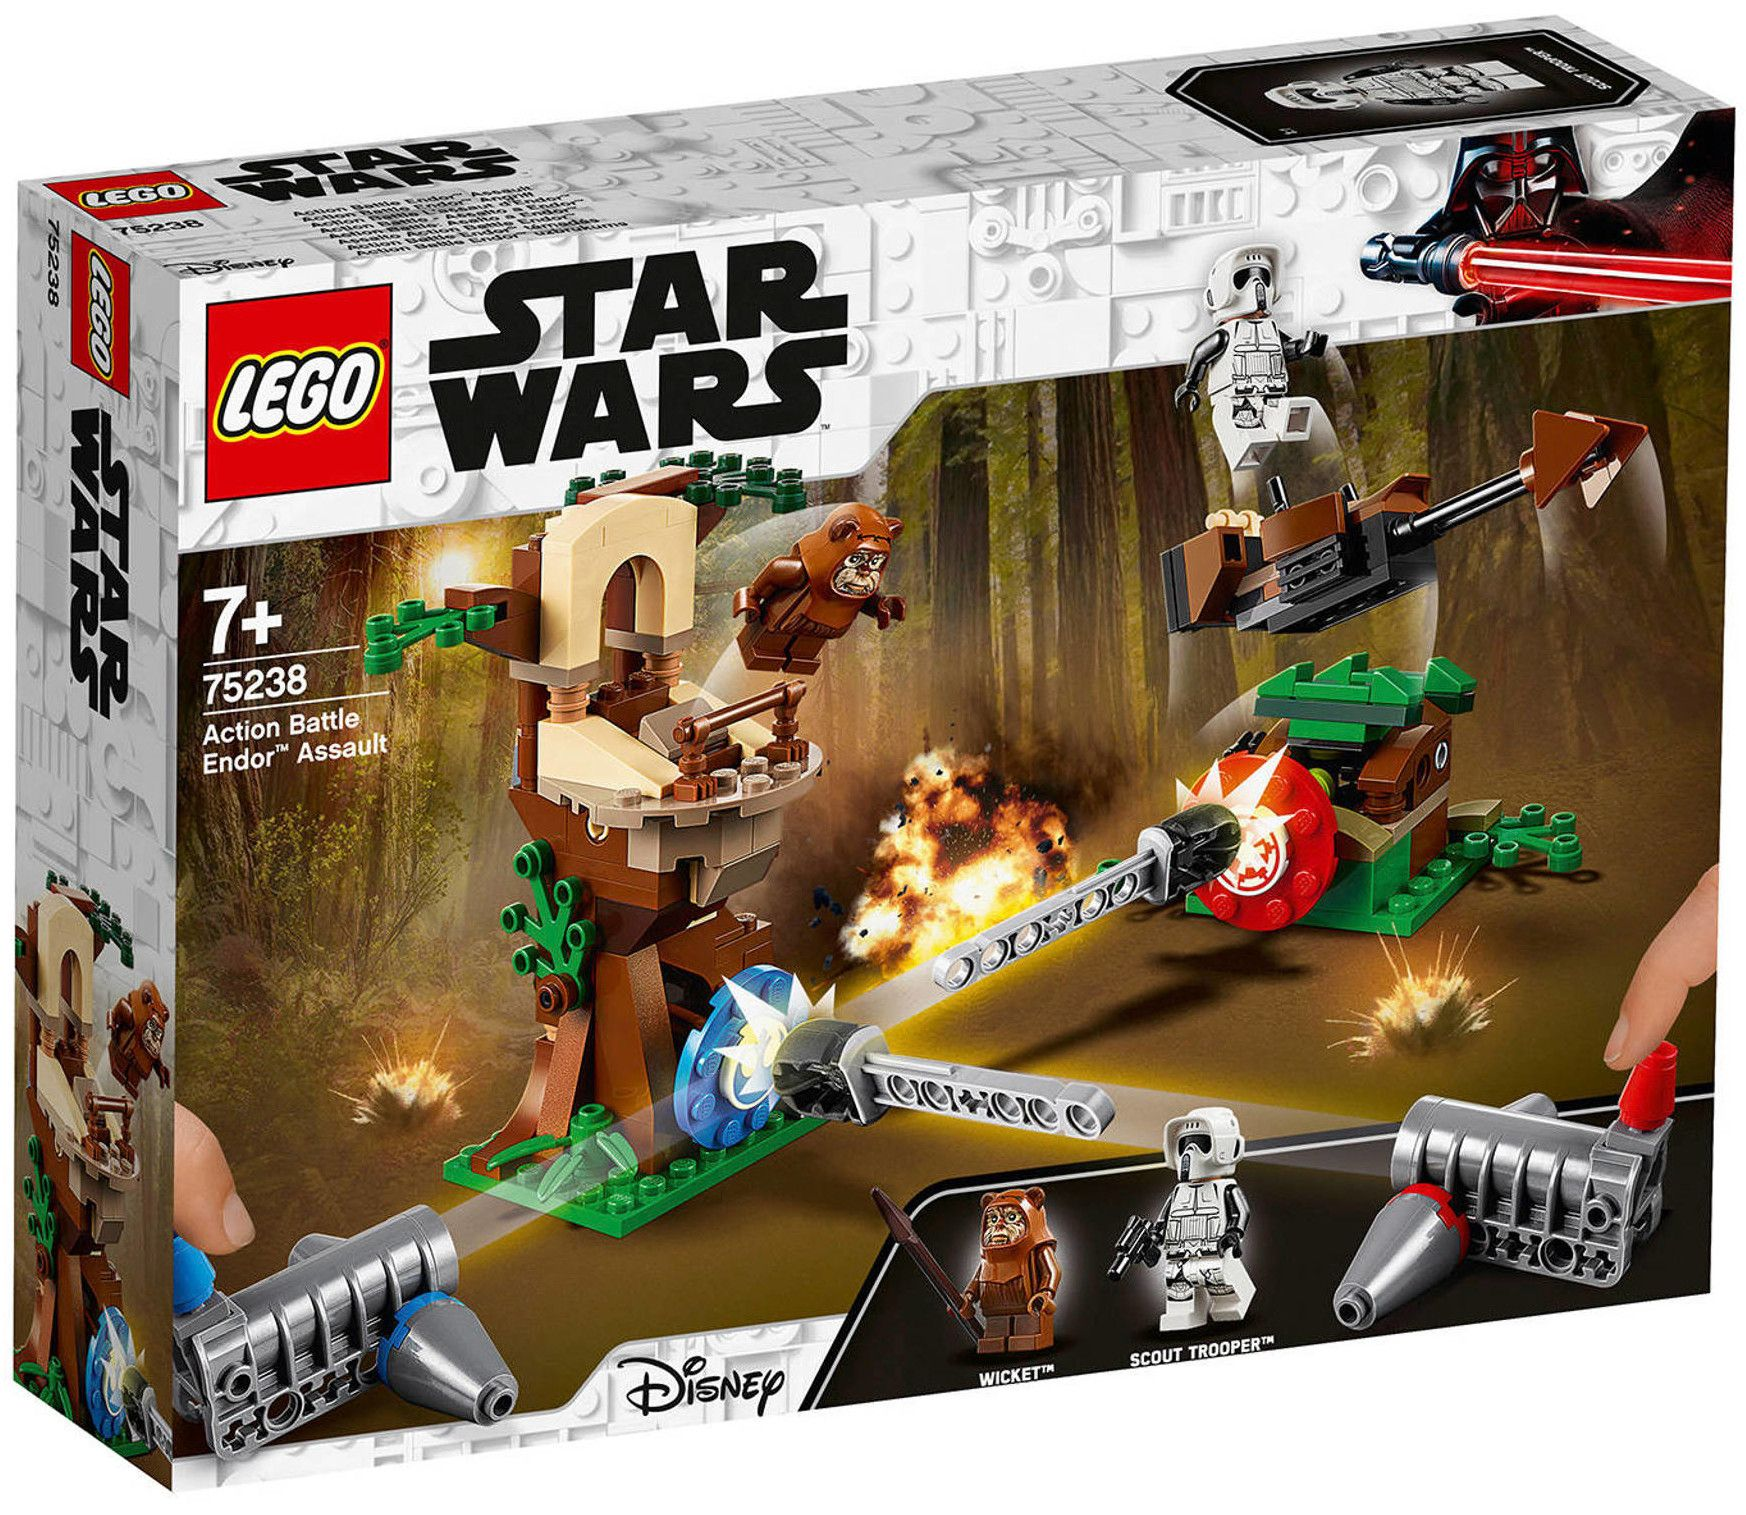 Конструктор Lego Star Wars - Action Battle Endor Assault (75238) - 1